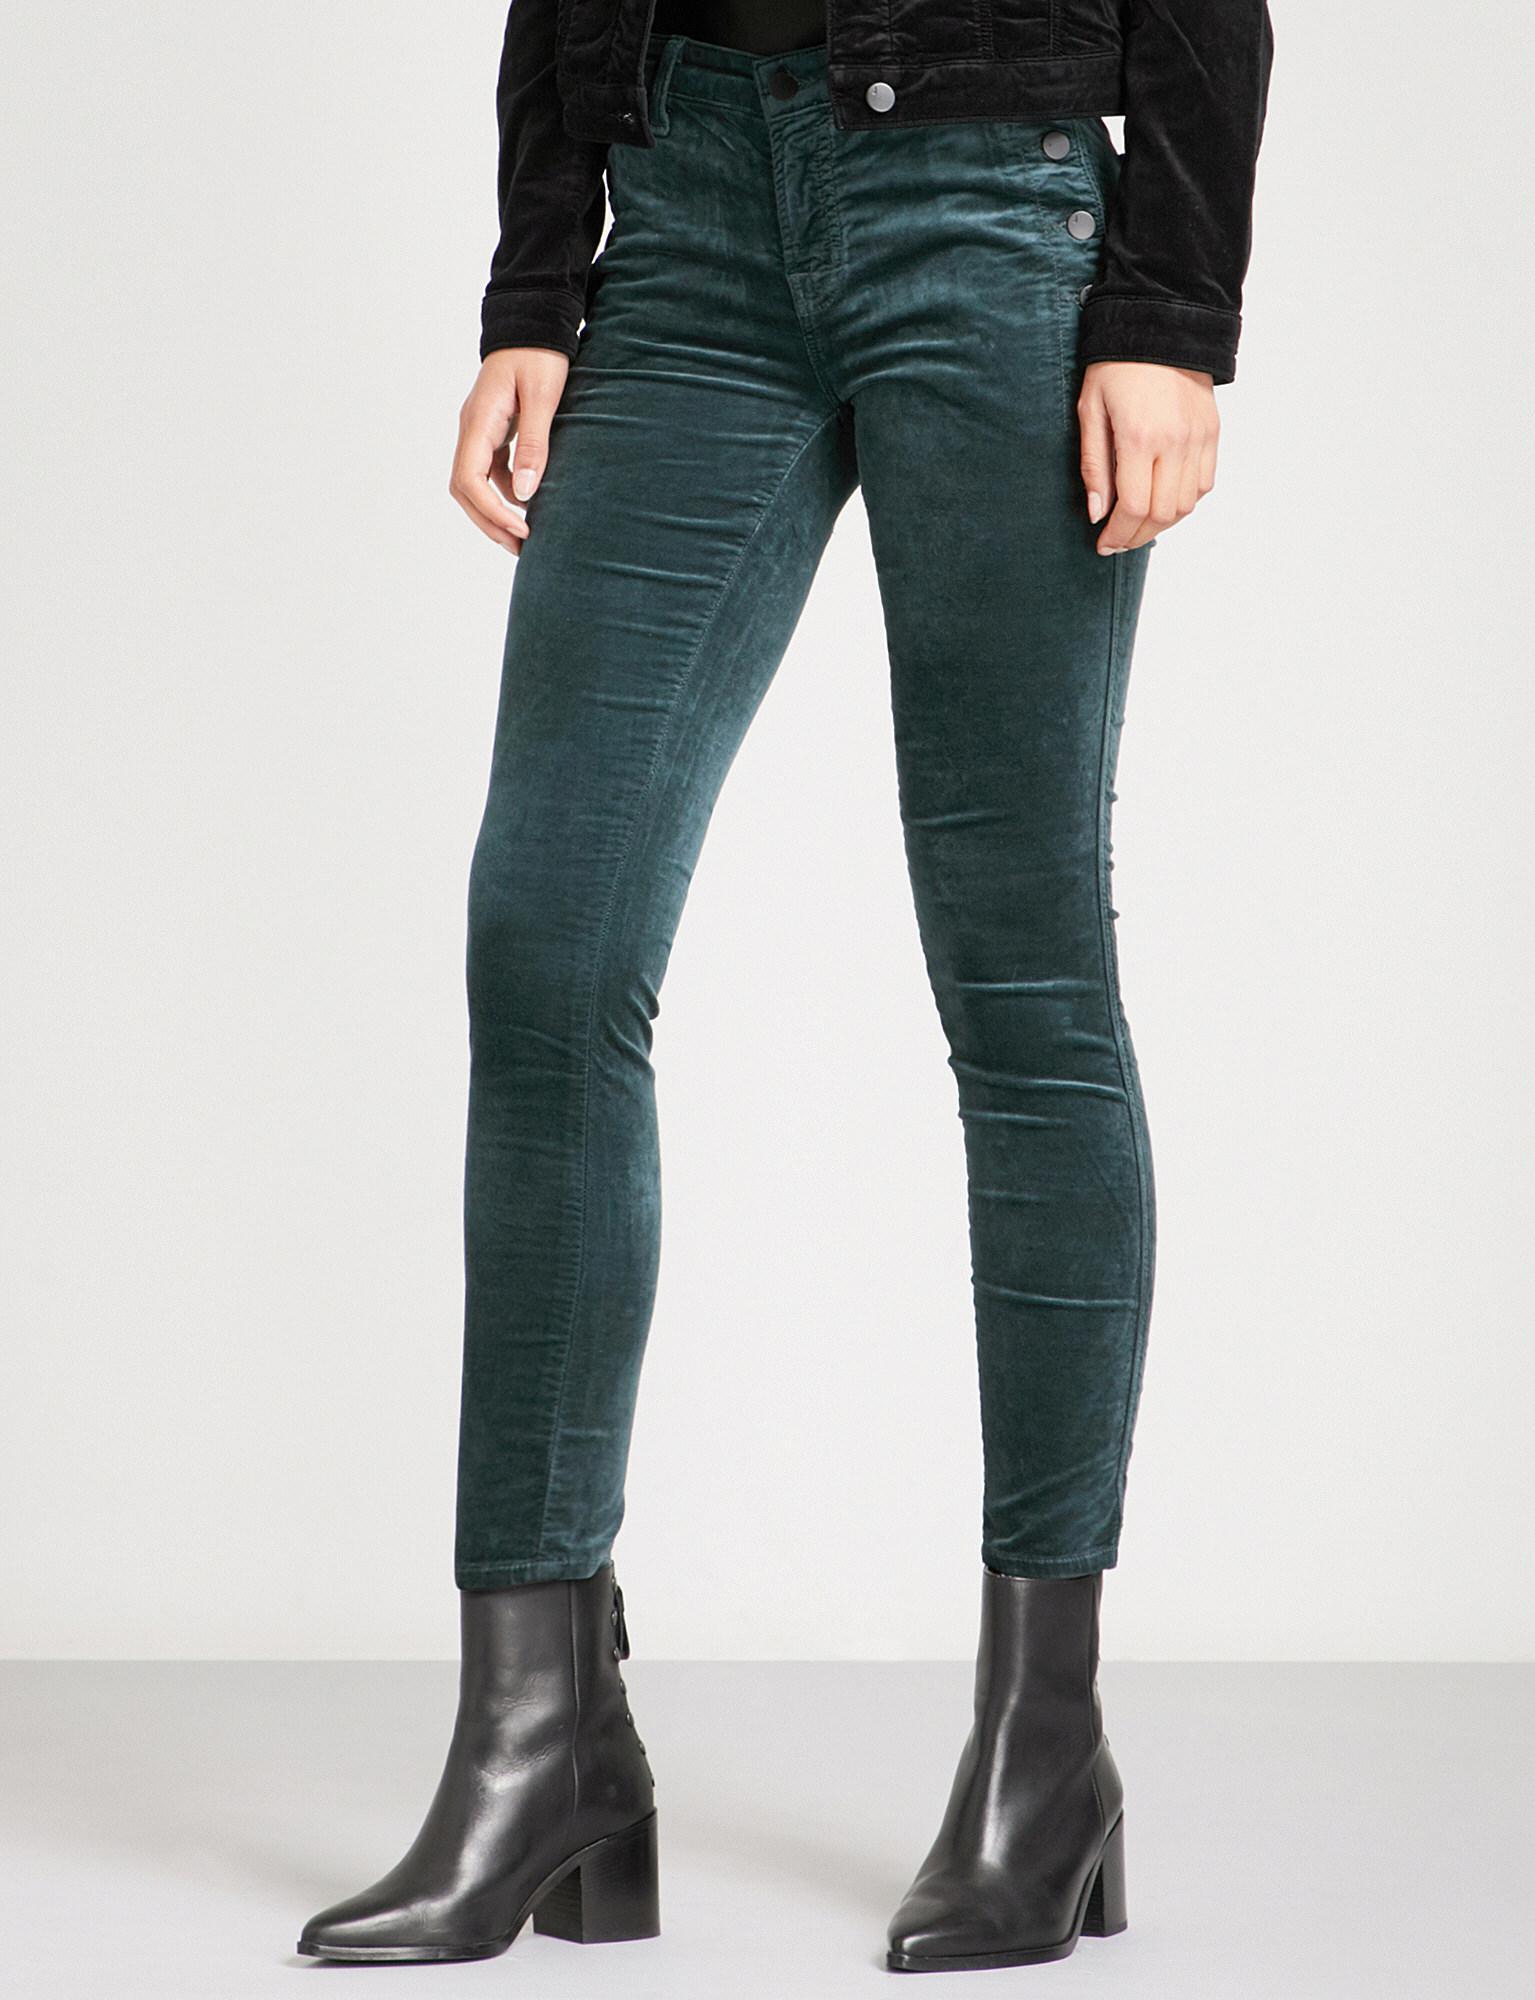 Zion jeans - Green J Brand q1Hl2LYFi